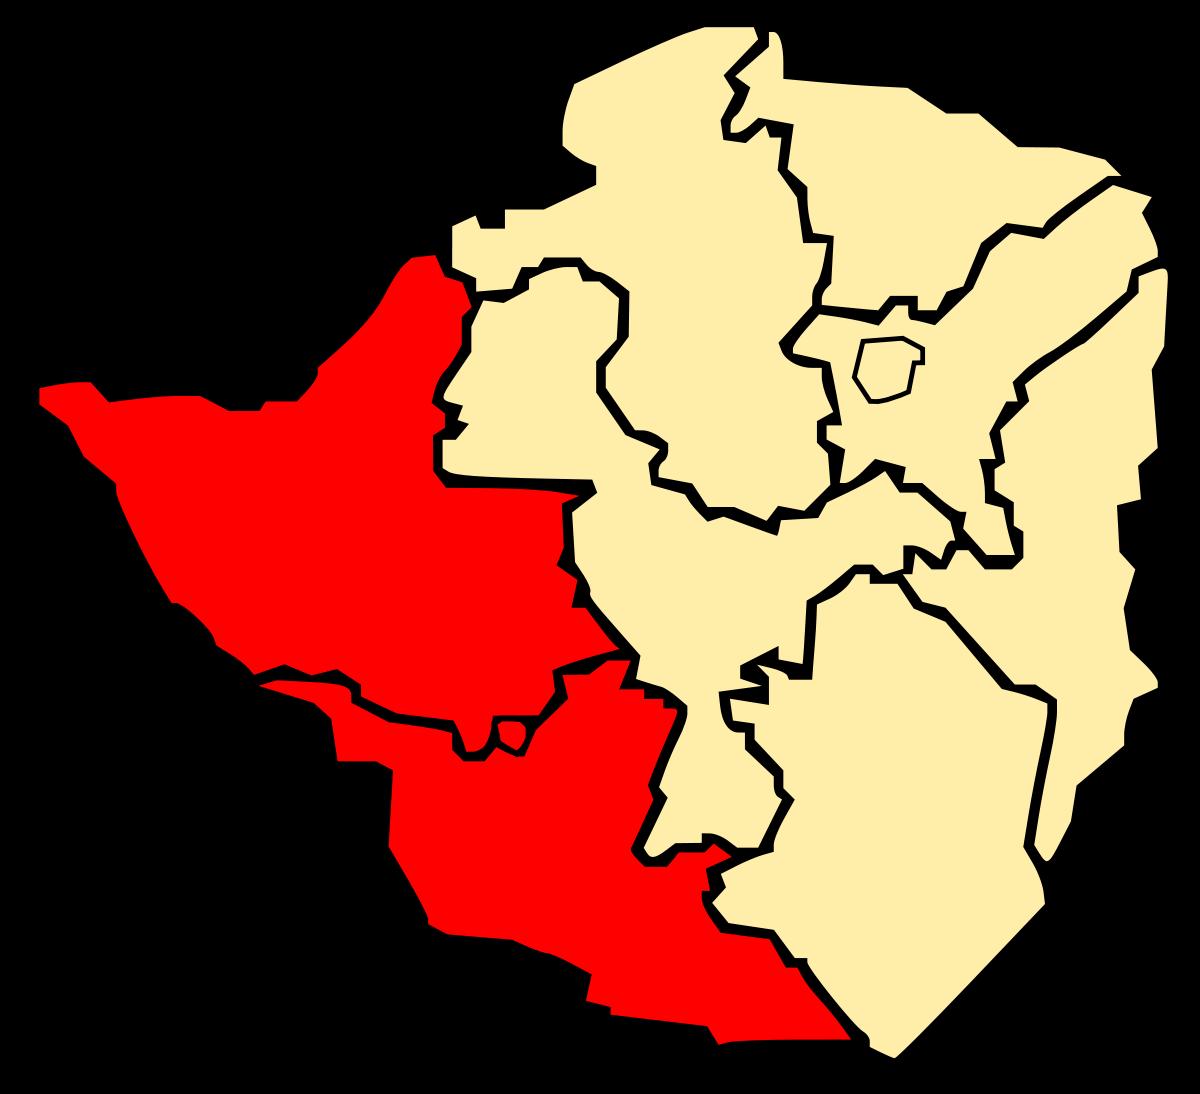 Pioneer clipart frontiersman. Matabeleland wikipedia